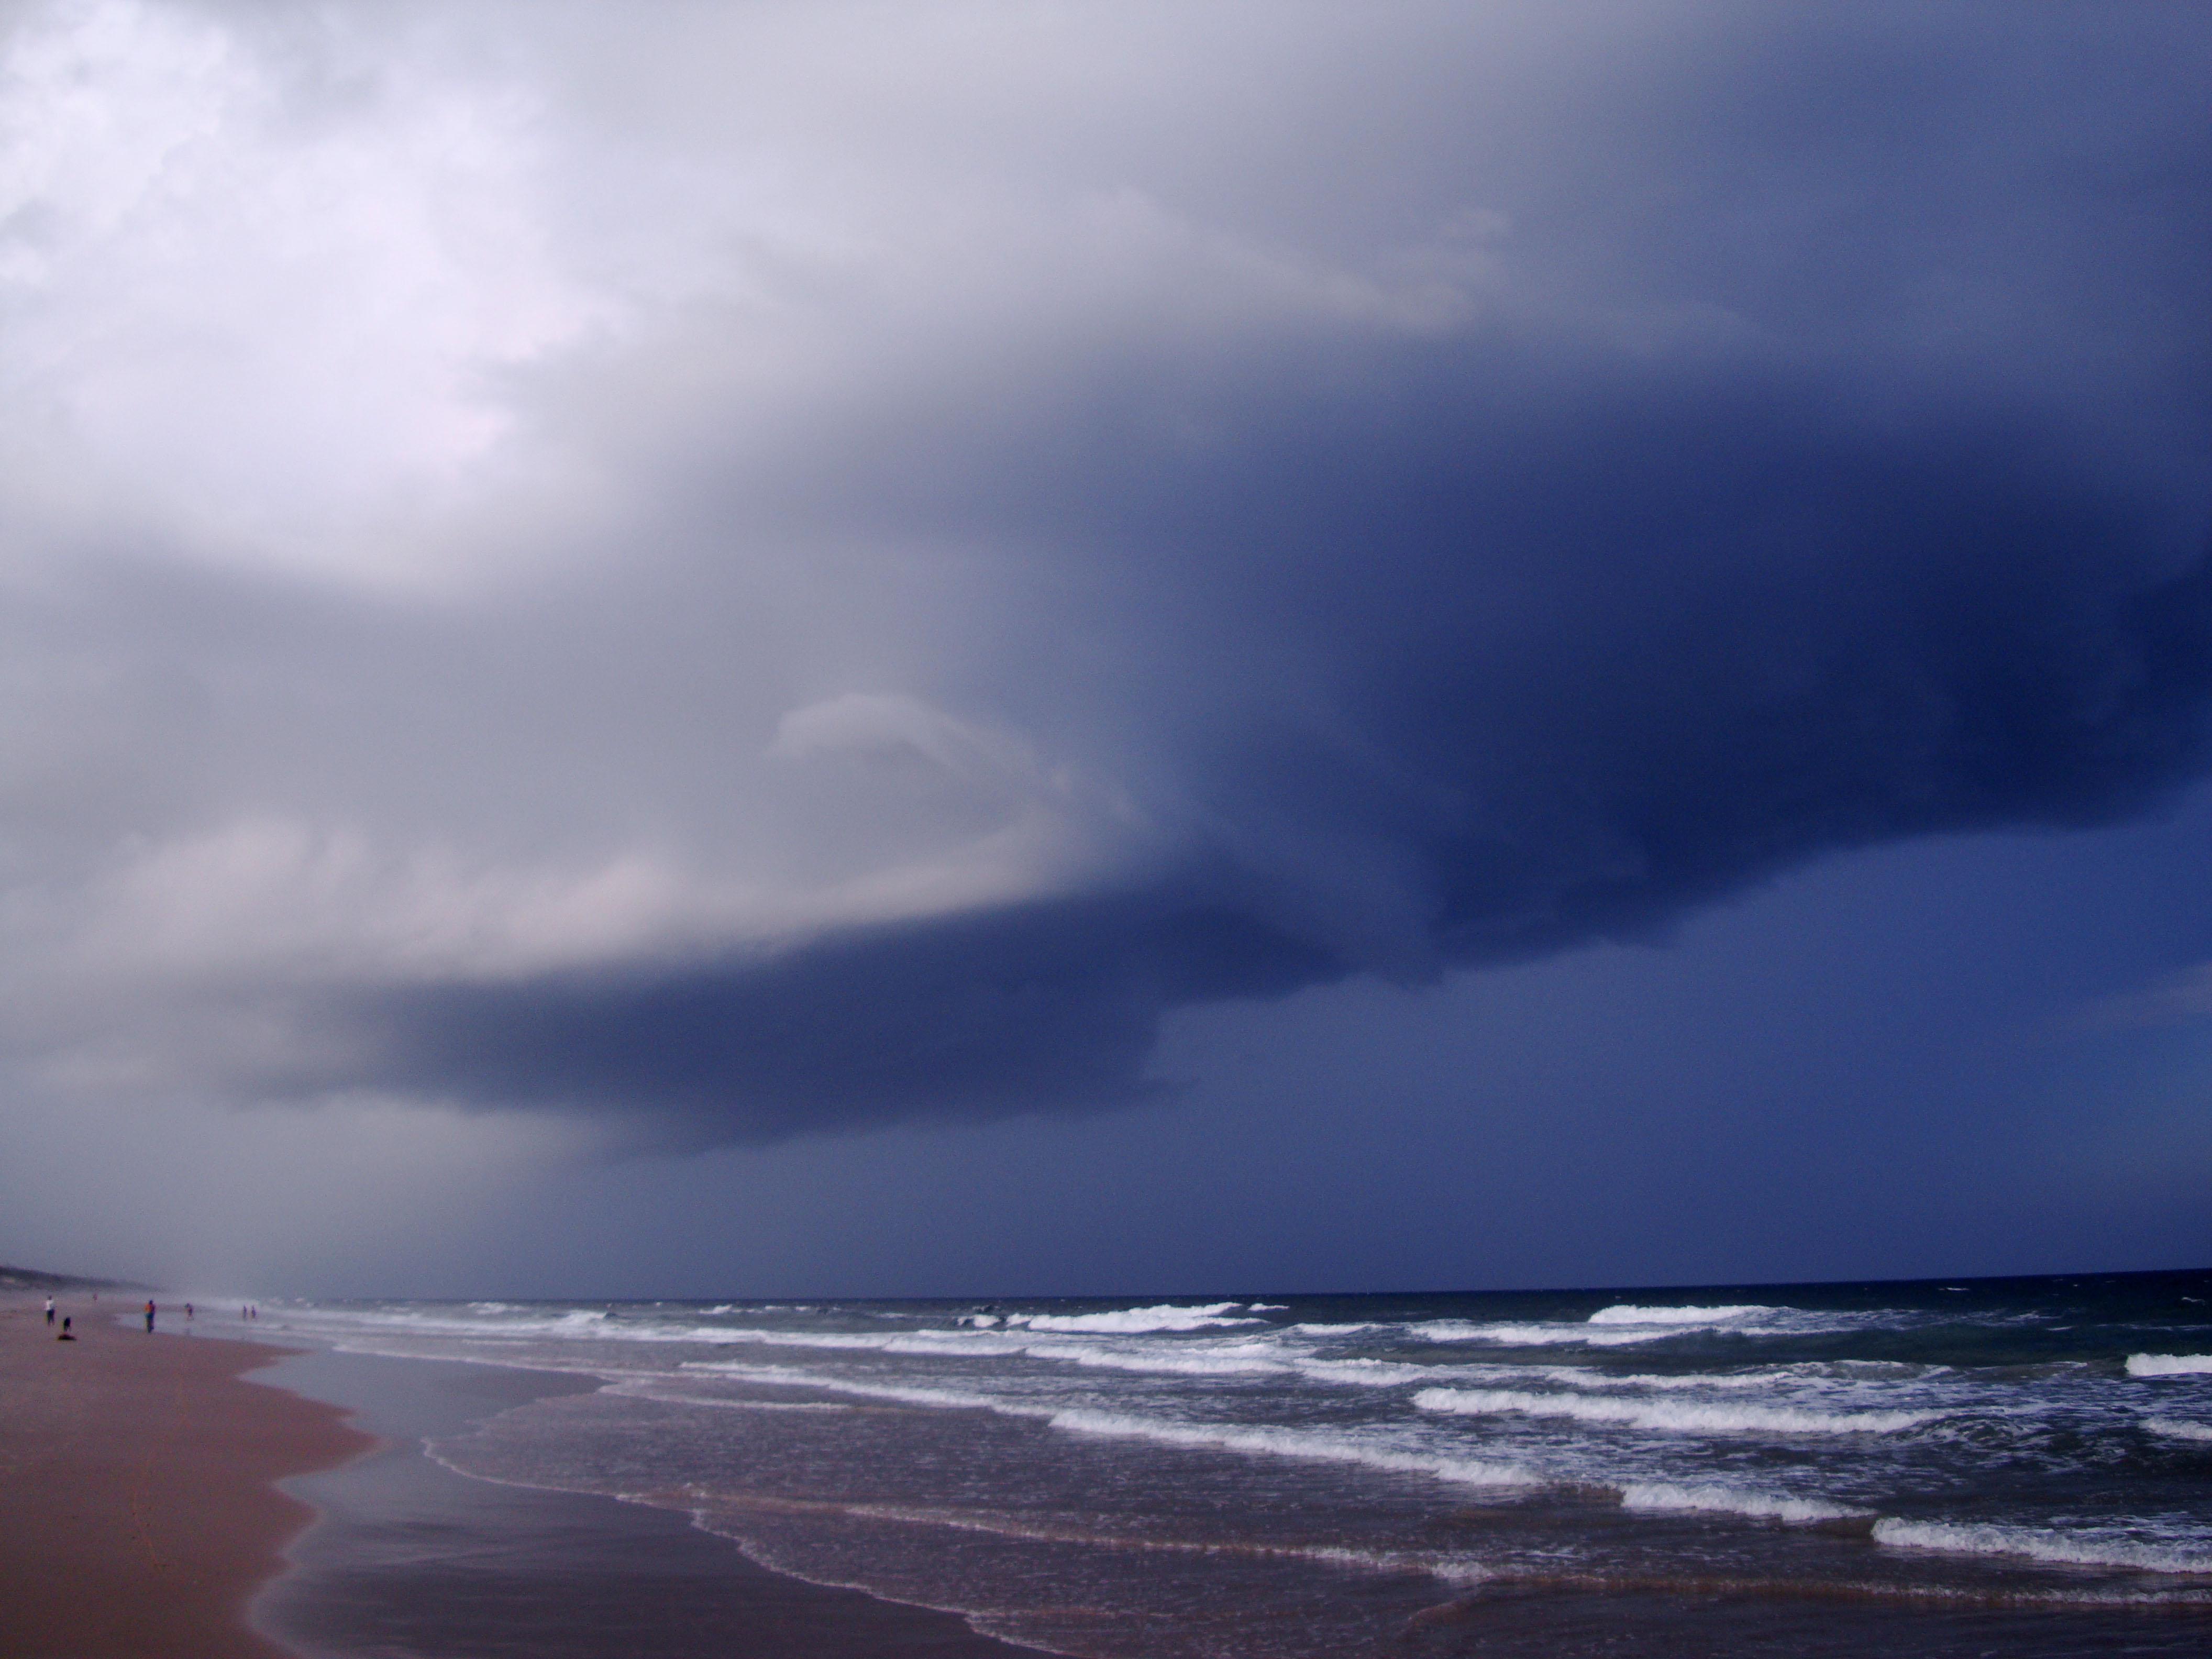 Cumulonimbus Clouds Formations Sky Storms Weather Phenomena 14